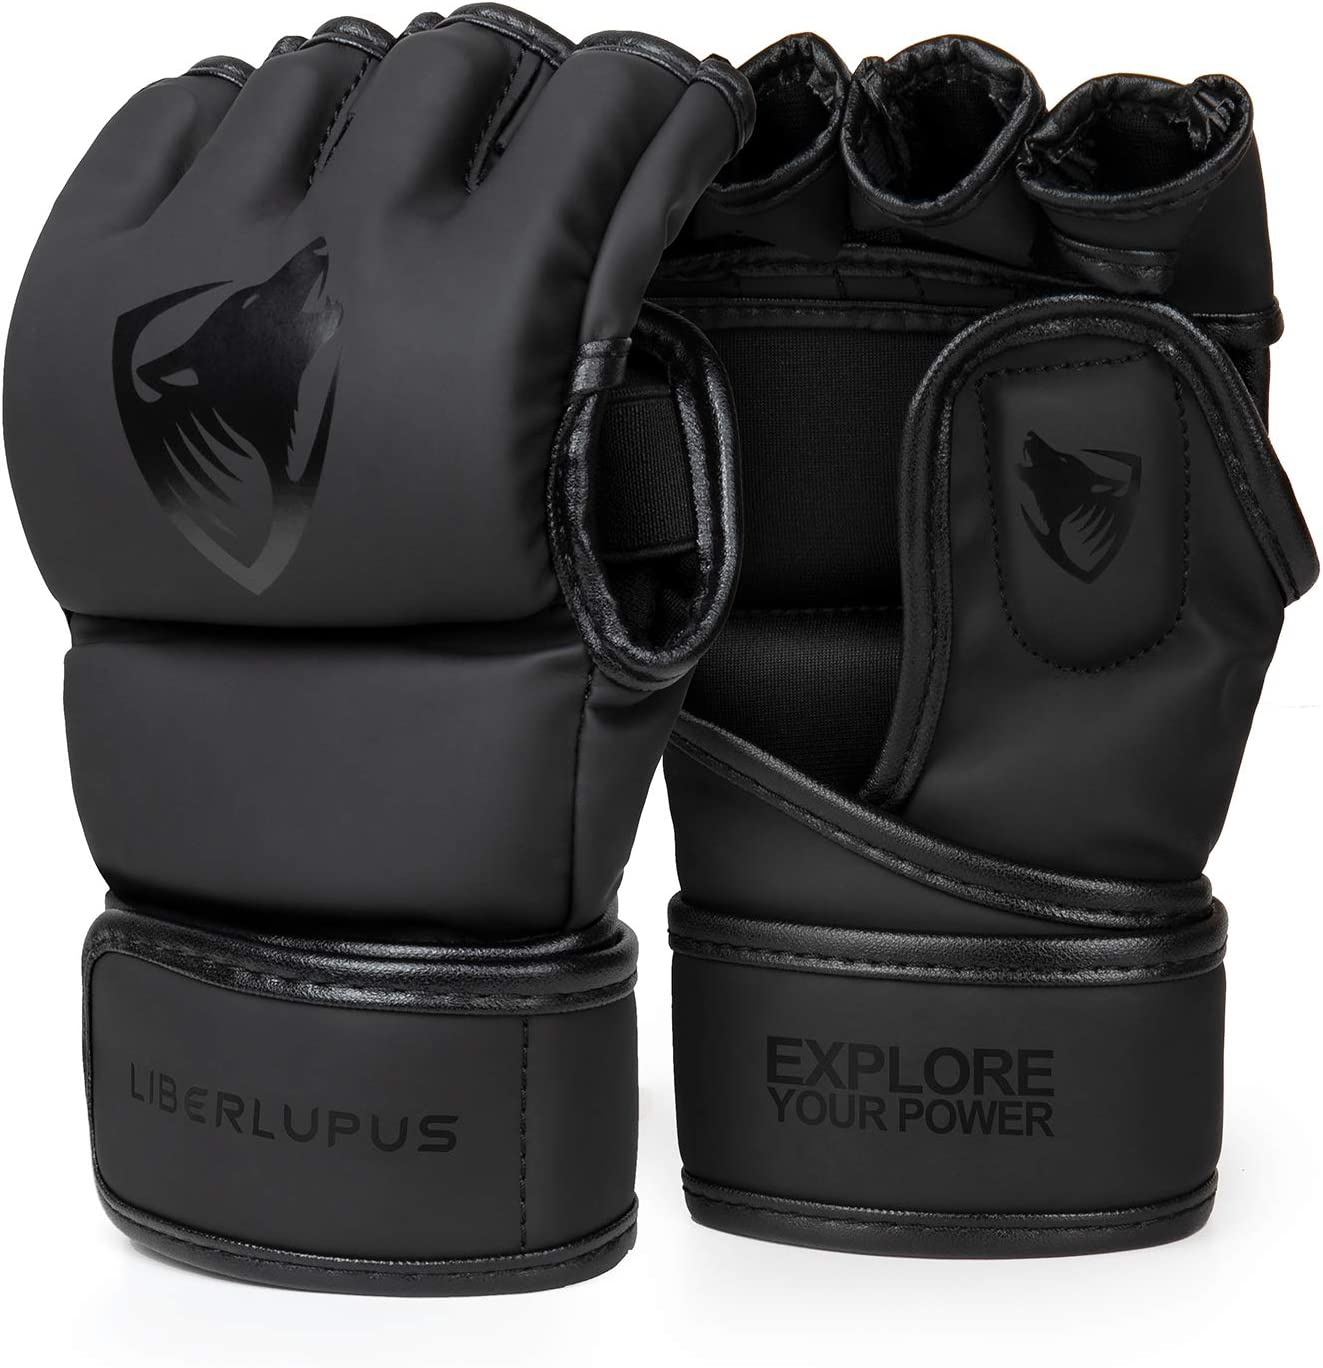 Liberlupus MMA Gloves for Men & Women, Kickboxing Gloves with Open Palms, Boxing Gloves for Punching Bag, Sparring, Muay Thai, MMA : Sports & Outdoors